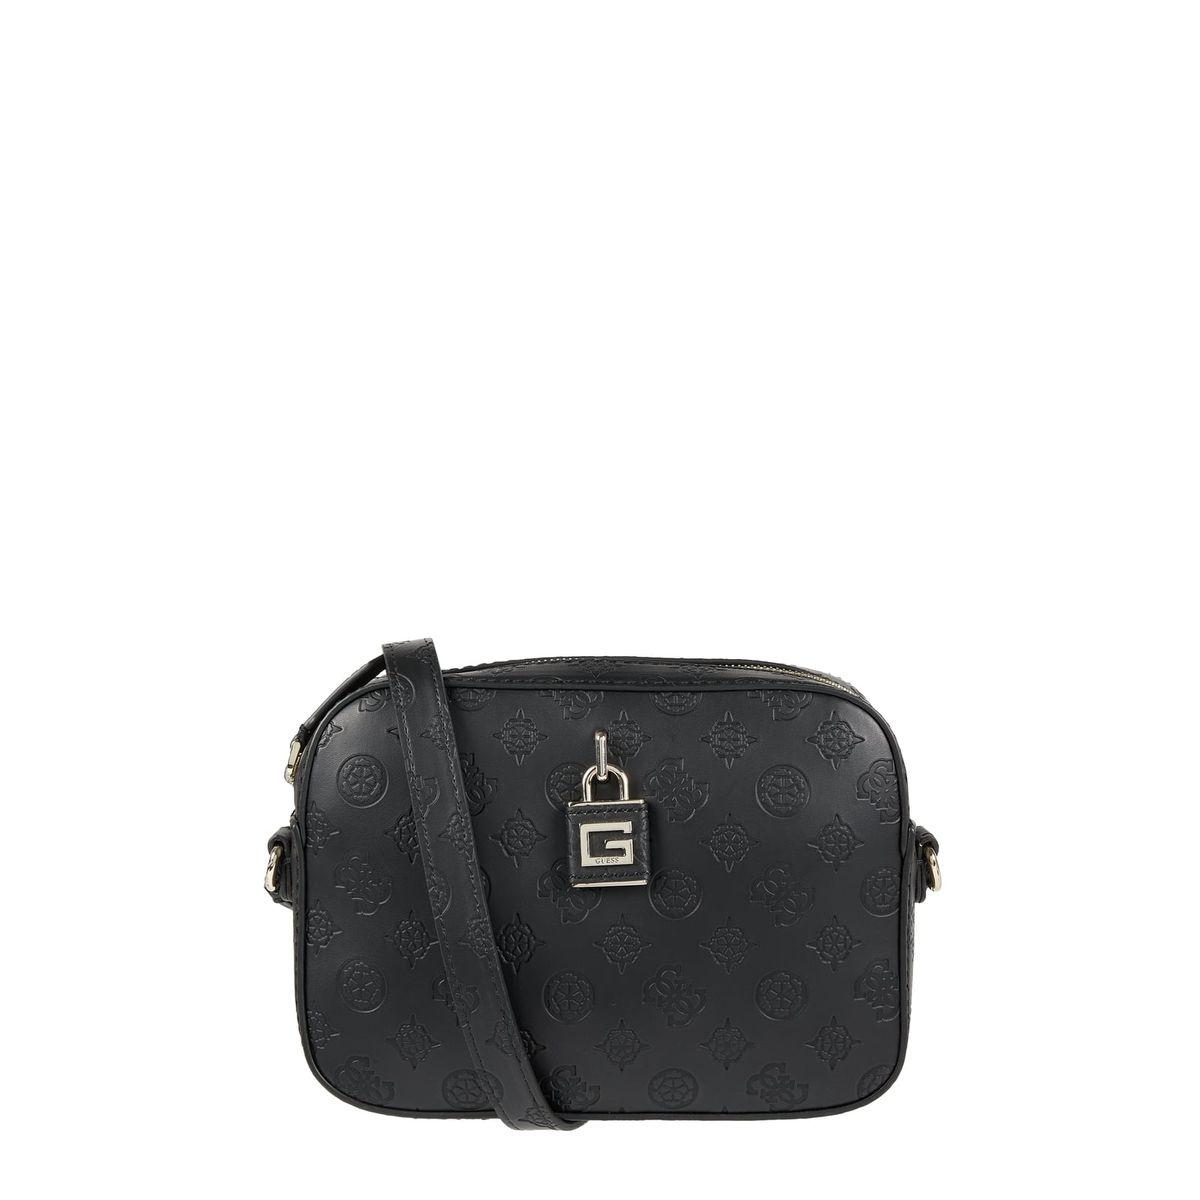 Guess Camera Bag in Leder-Optik Modell 'Kamryn'